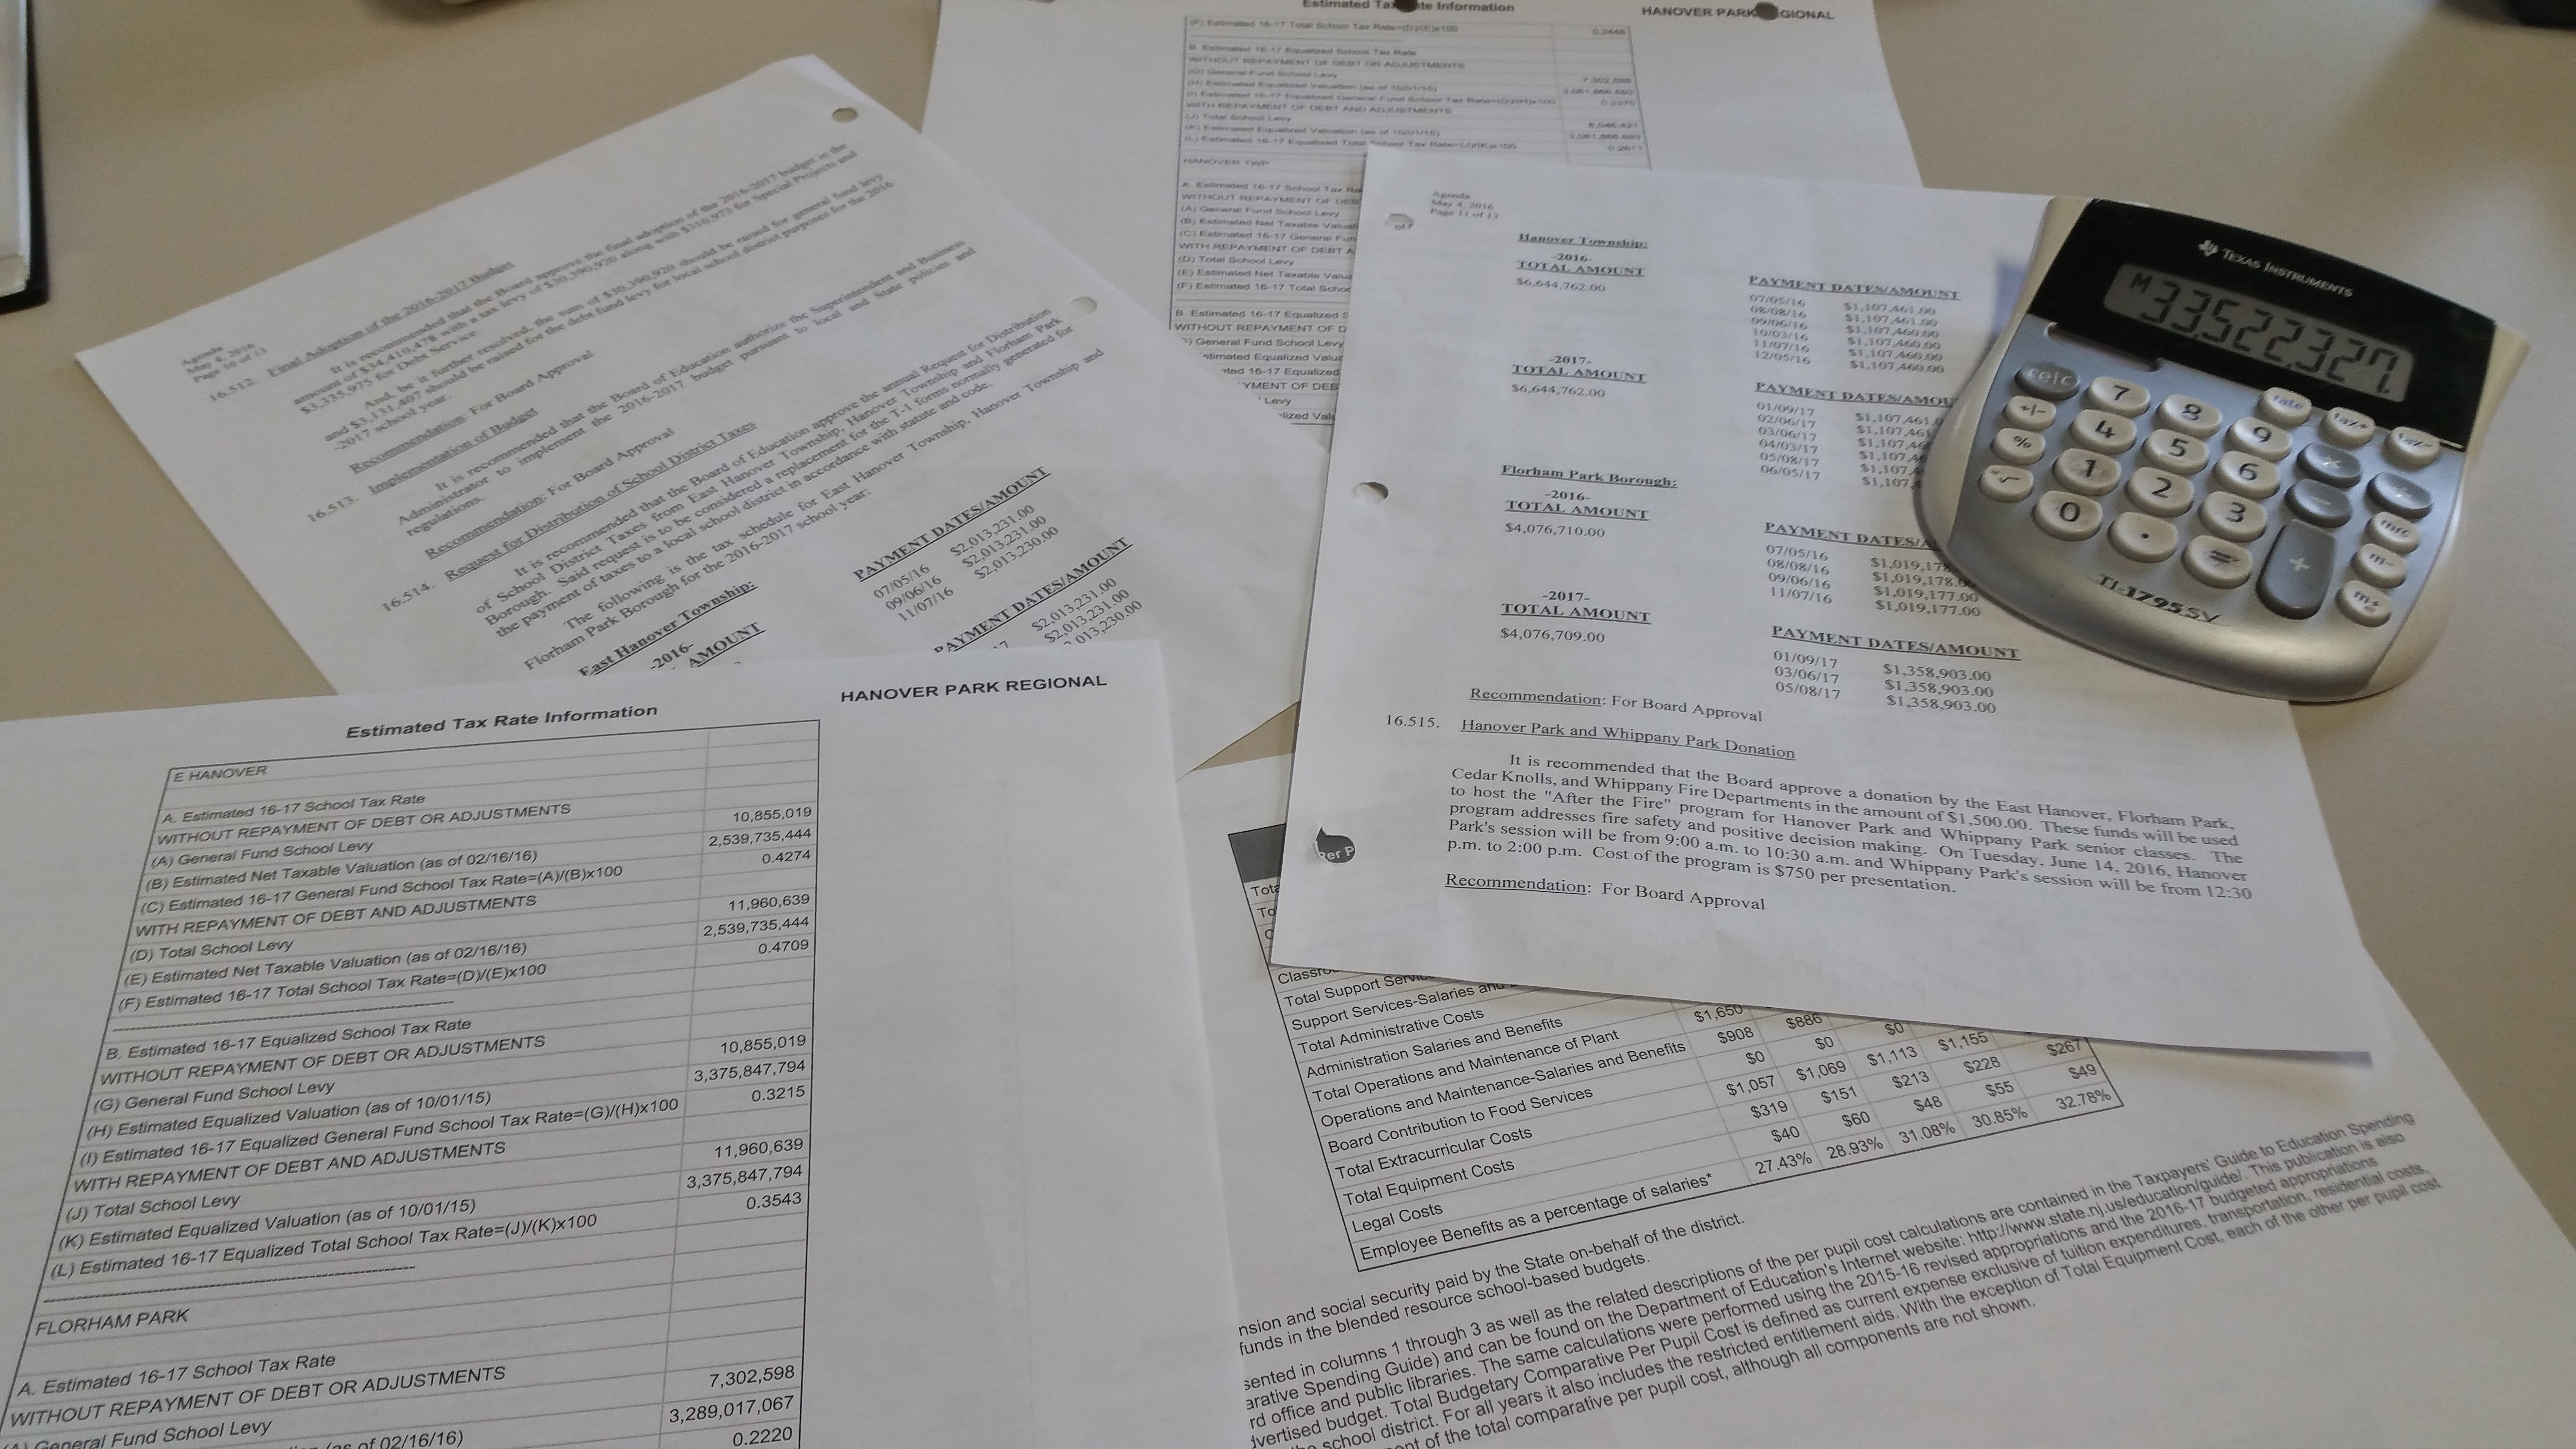 6b839e01581f8bdc3a5d_school_budget.jpg